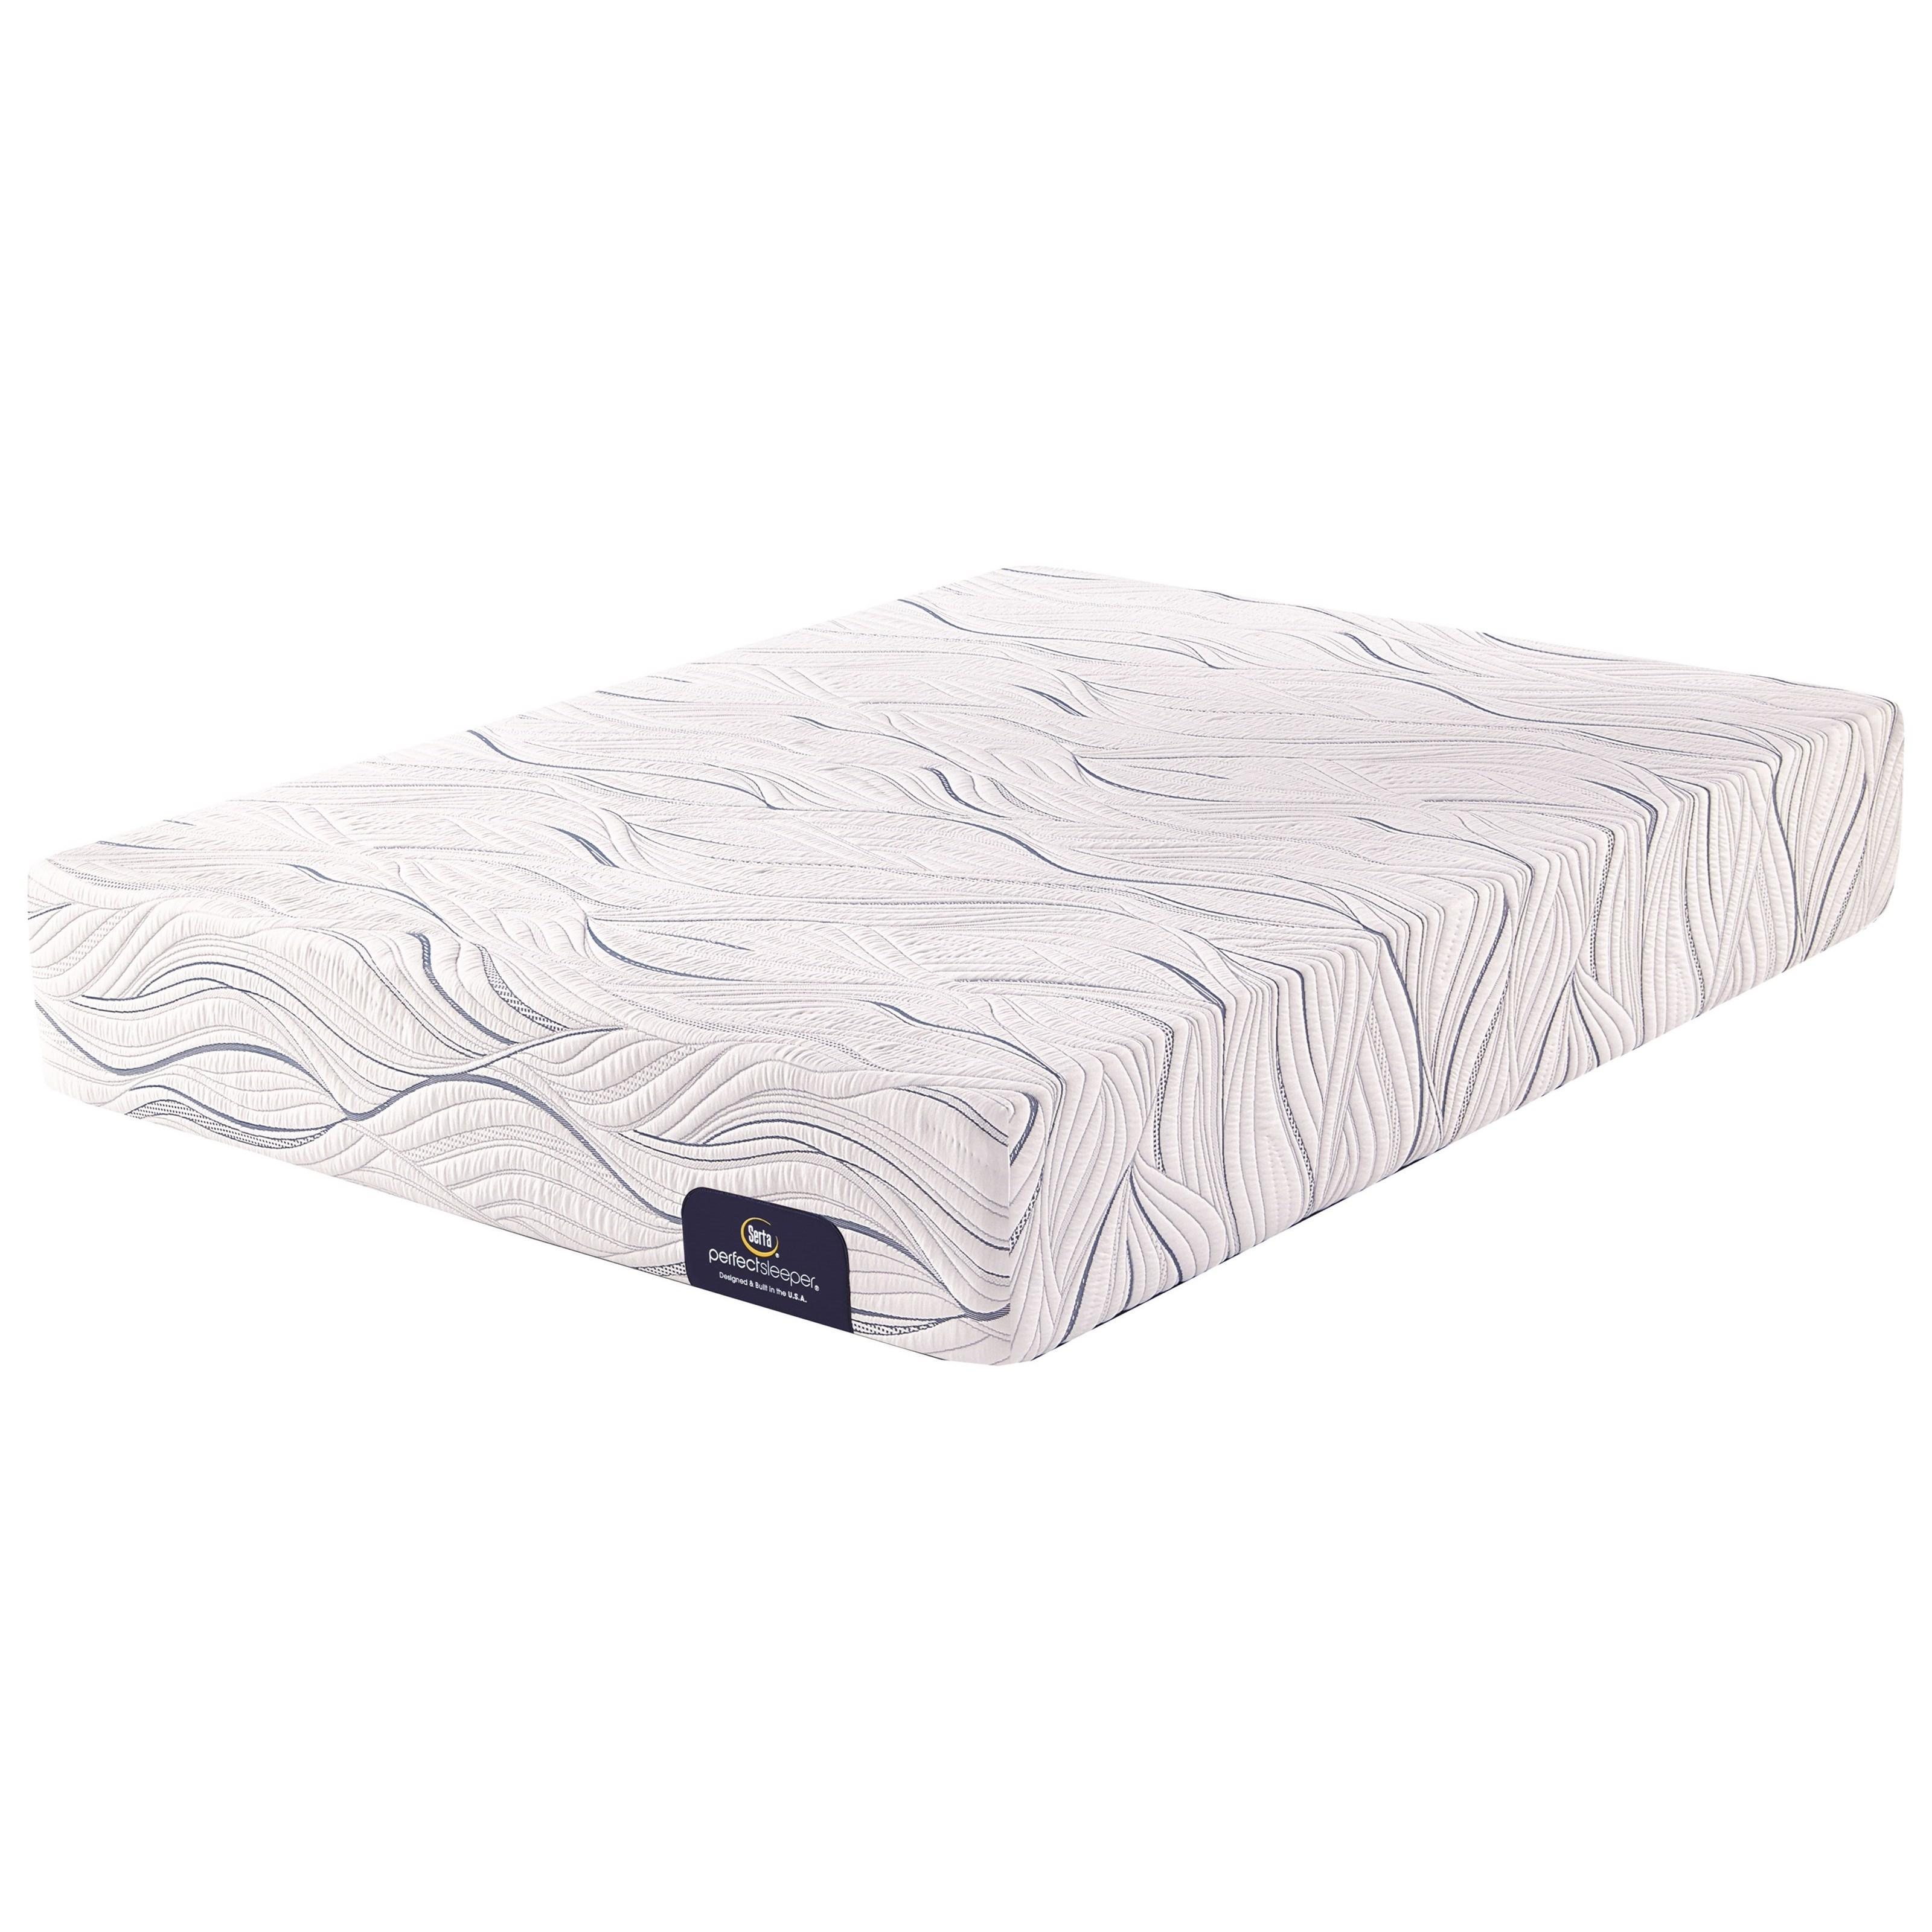 home mattresses mattresses serta chesterton plush queen plush gel memory foam mattress image may not represent size indicated